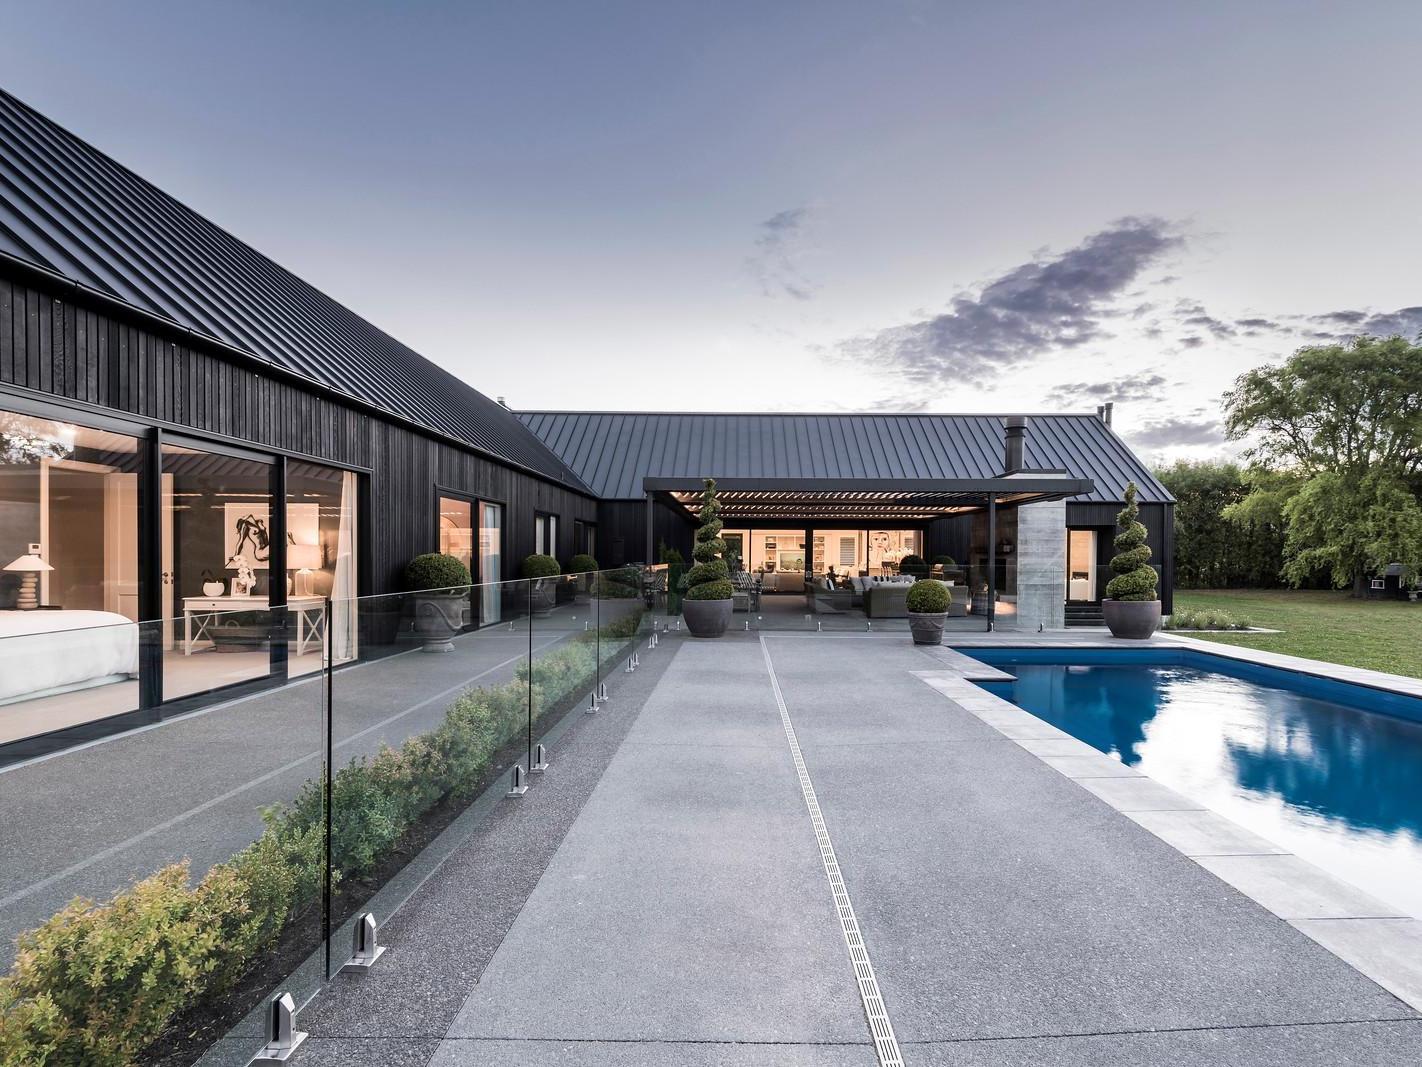 Ohoka House exterior designed by O'Neil Architecture